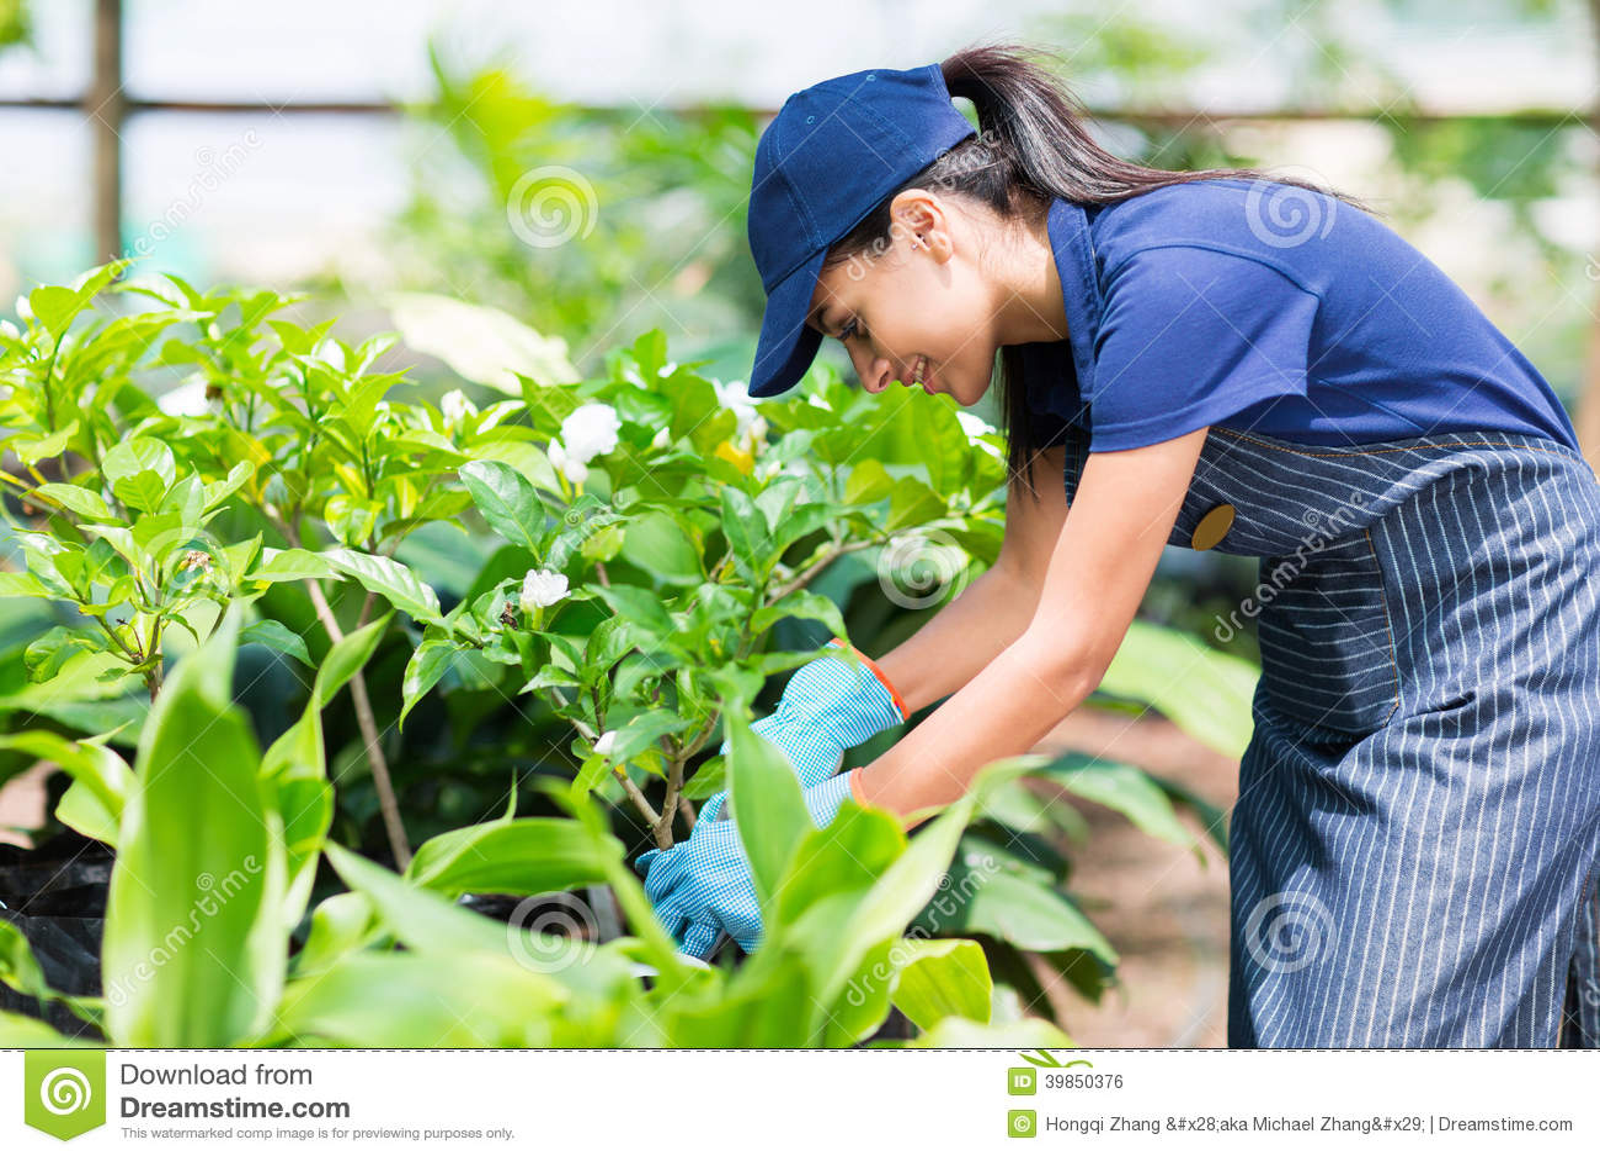 Nursery Worker Greenhouse Stock Photo - Image: 39850376